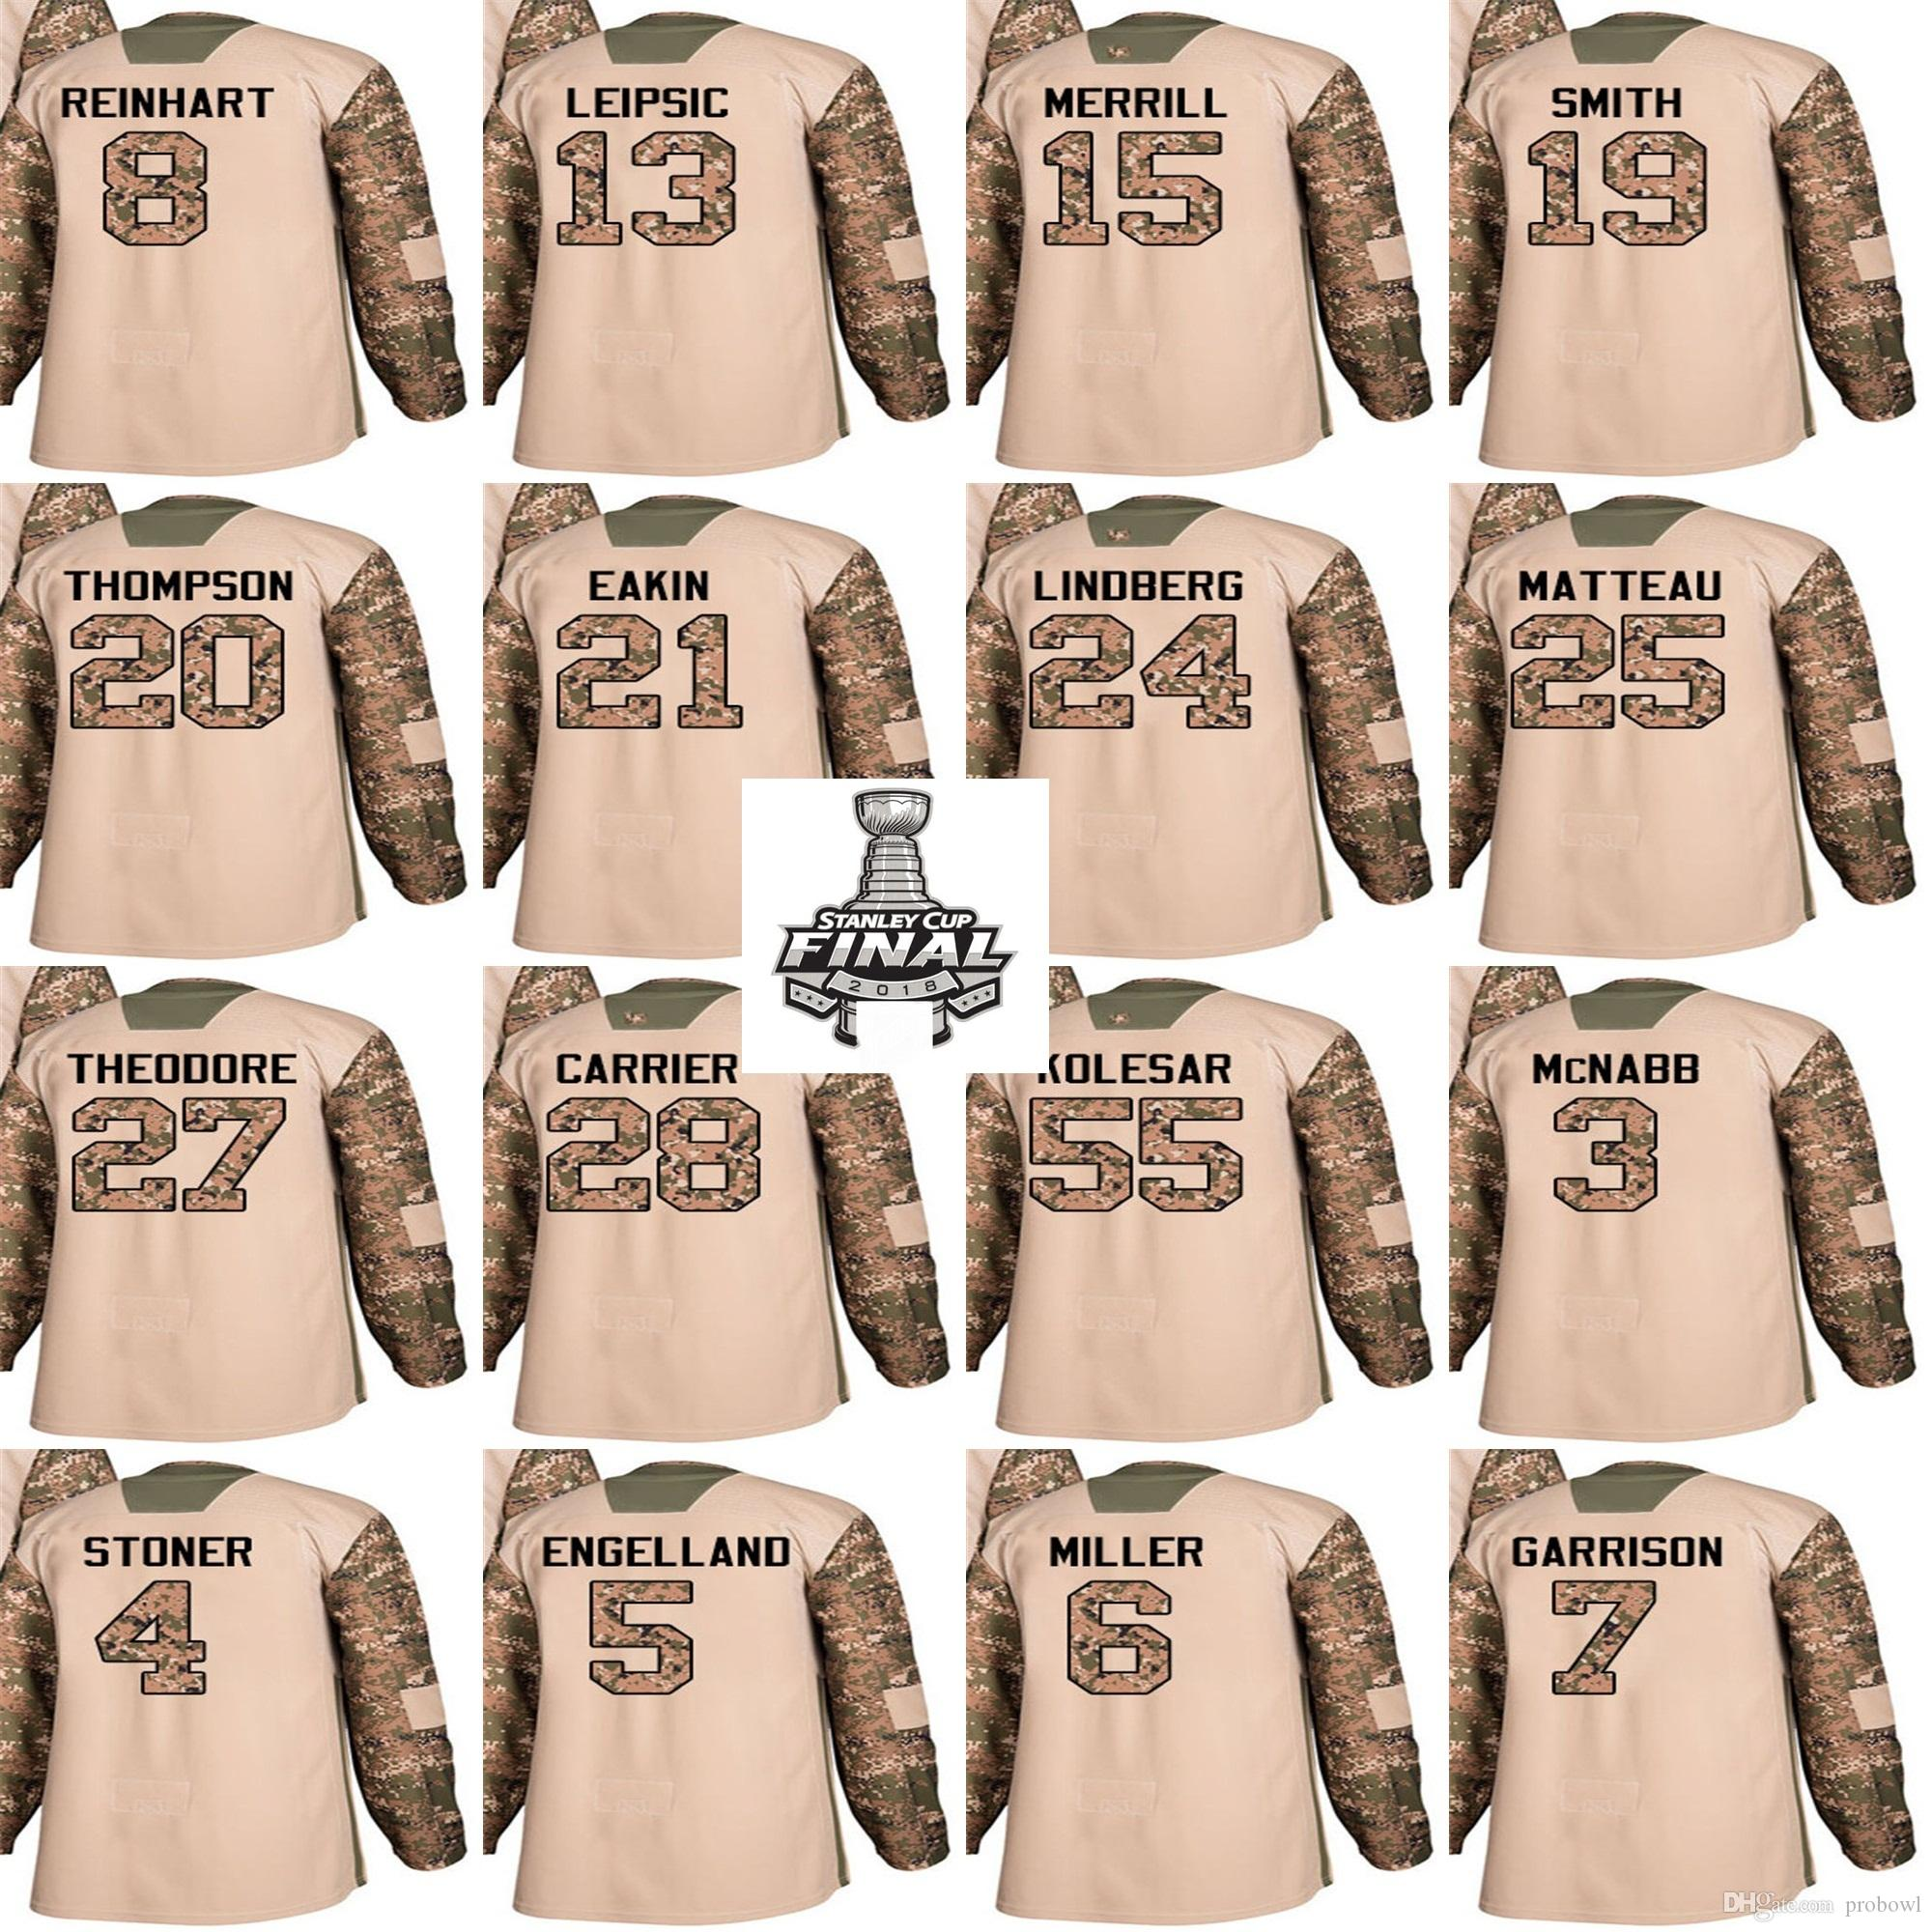 best loved d5ceb 8c1f1 2018 Finals Patch Vegas Golden 2017 Veterans Day Hockey Jersey Knights Camo  James Neal Tomas William Karlsson Pulkkinen Marc-Andre Fleury